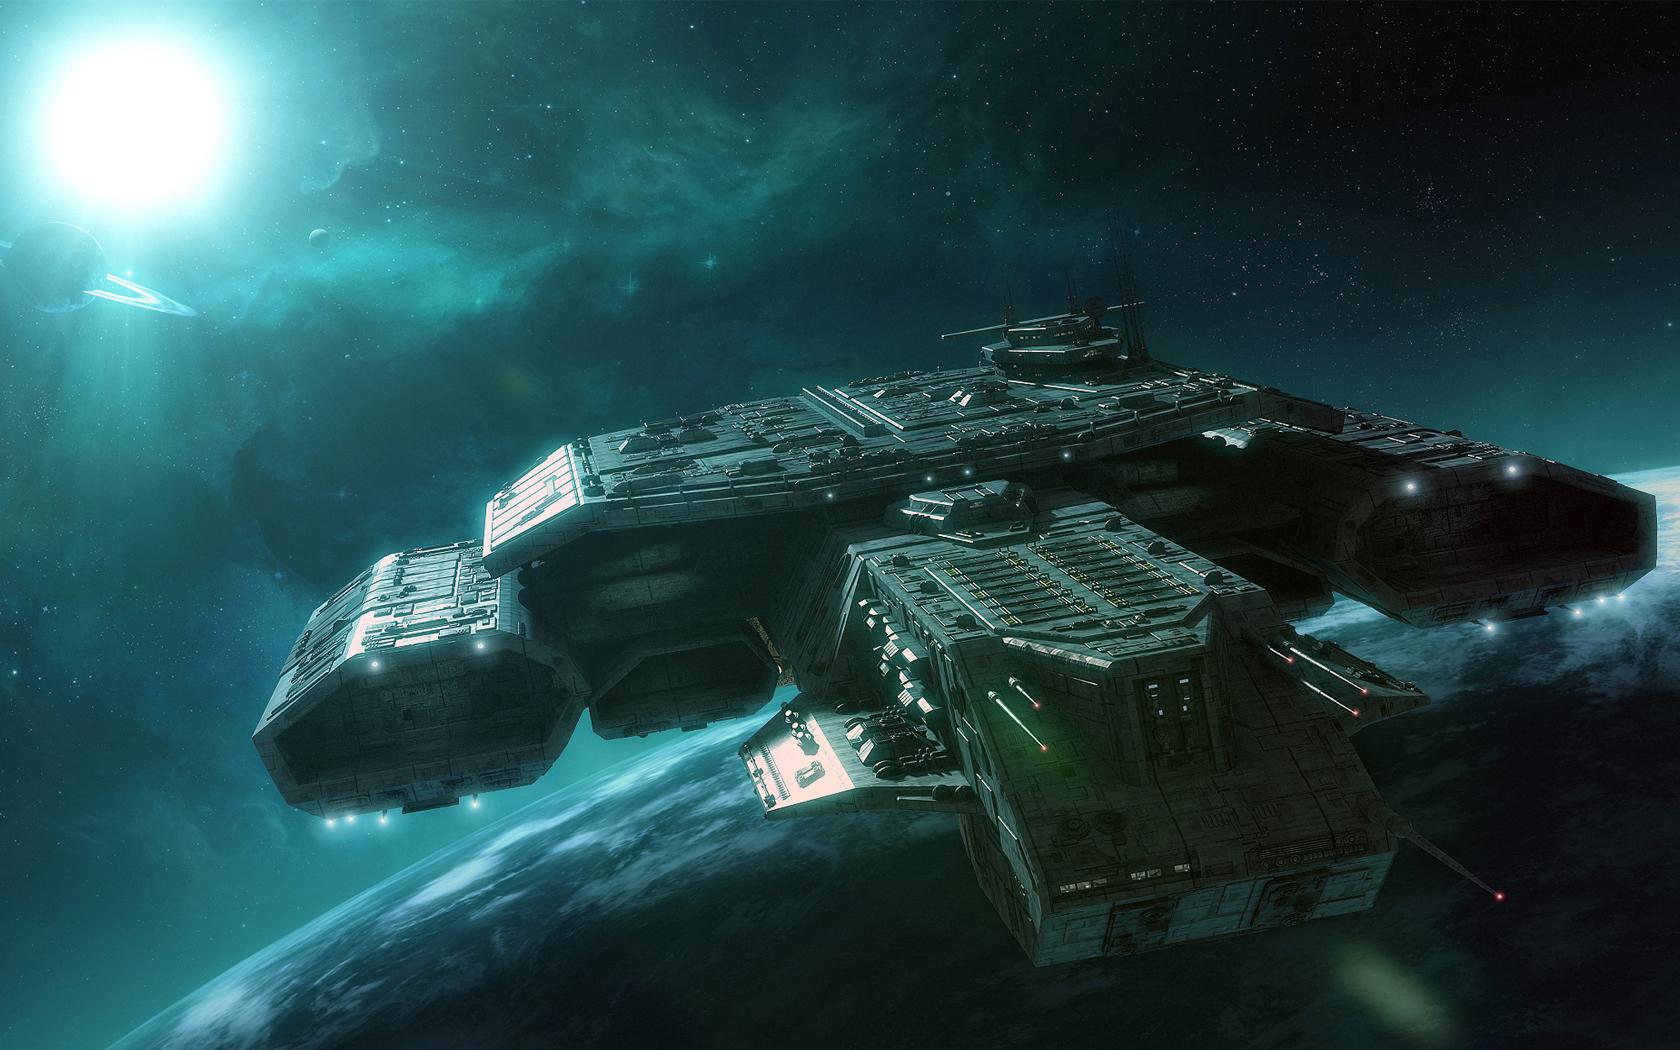 Download Stargate Spaceships Wallpaper 1680x1050 1680x1050